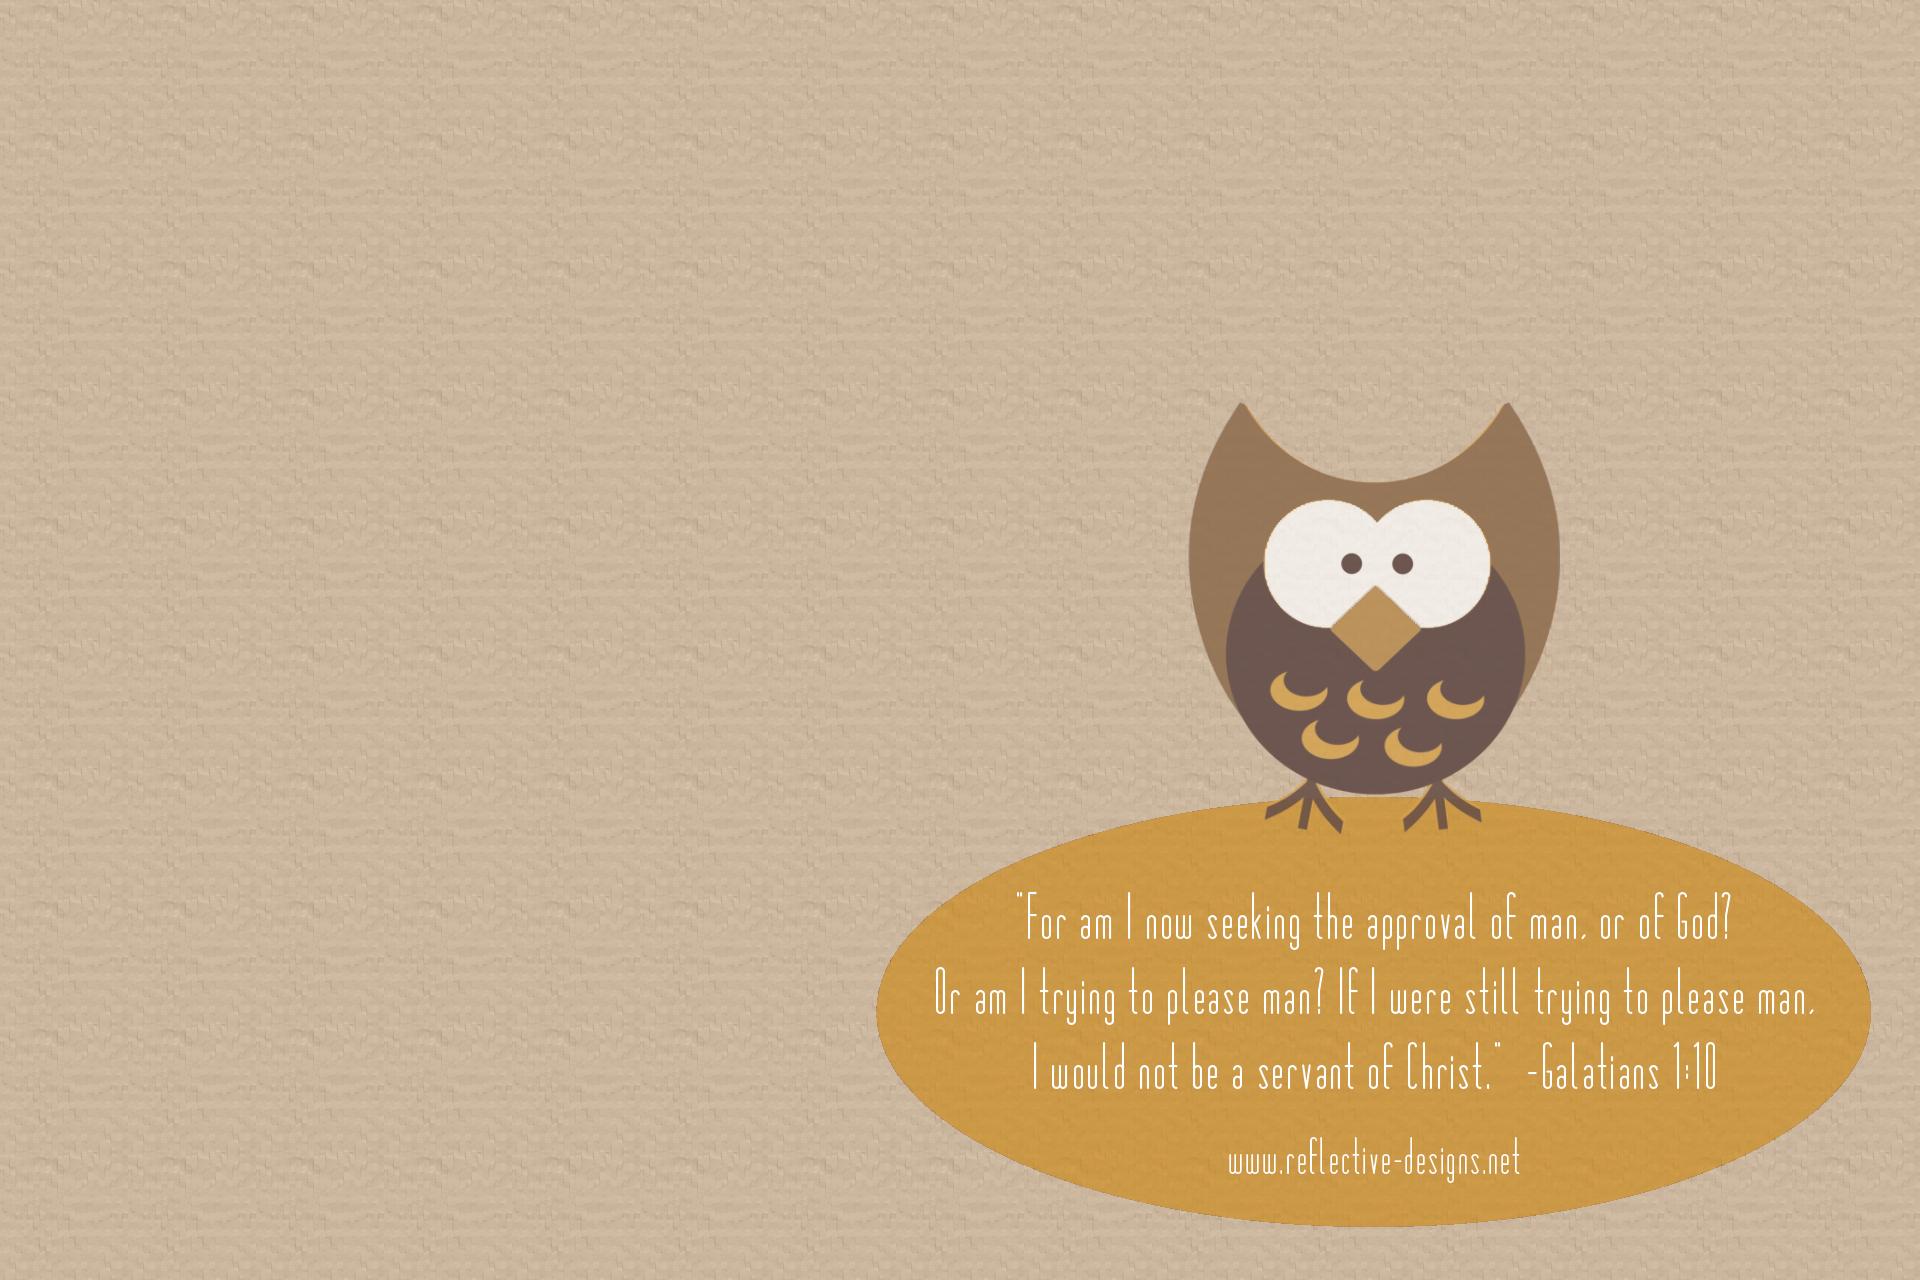 galatians 1 10 owl wallpaper free download